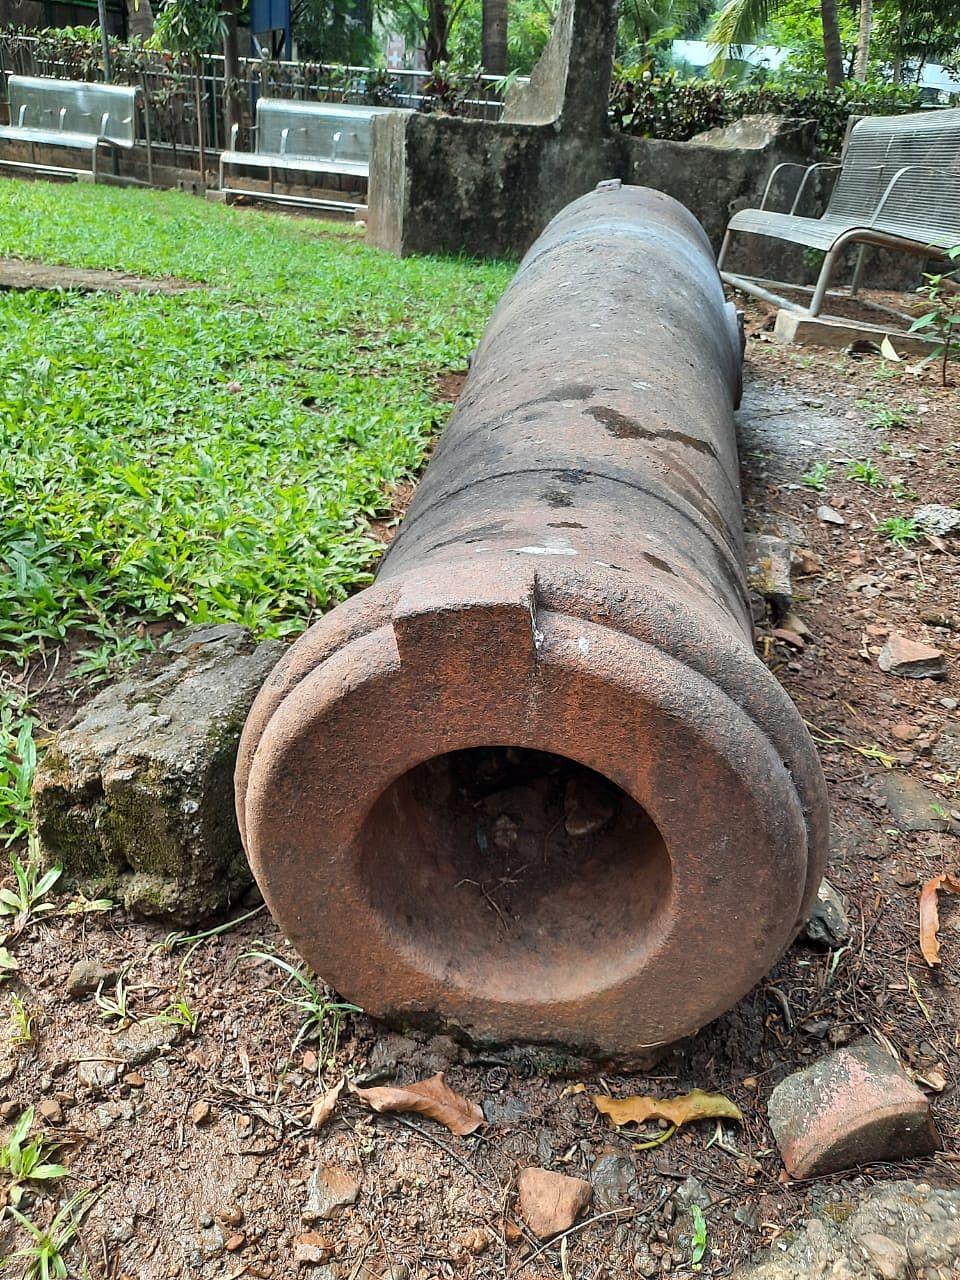 BMC to restore 18th-century cannons in Ghatkopar